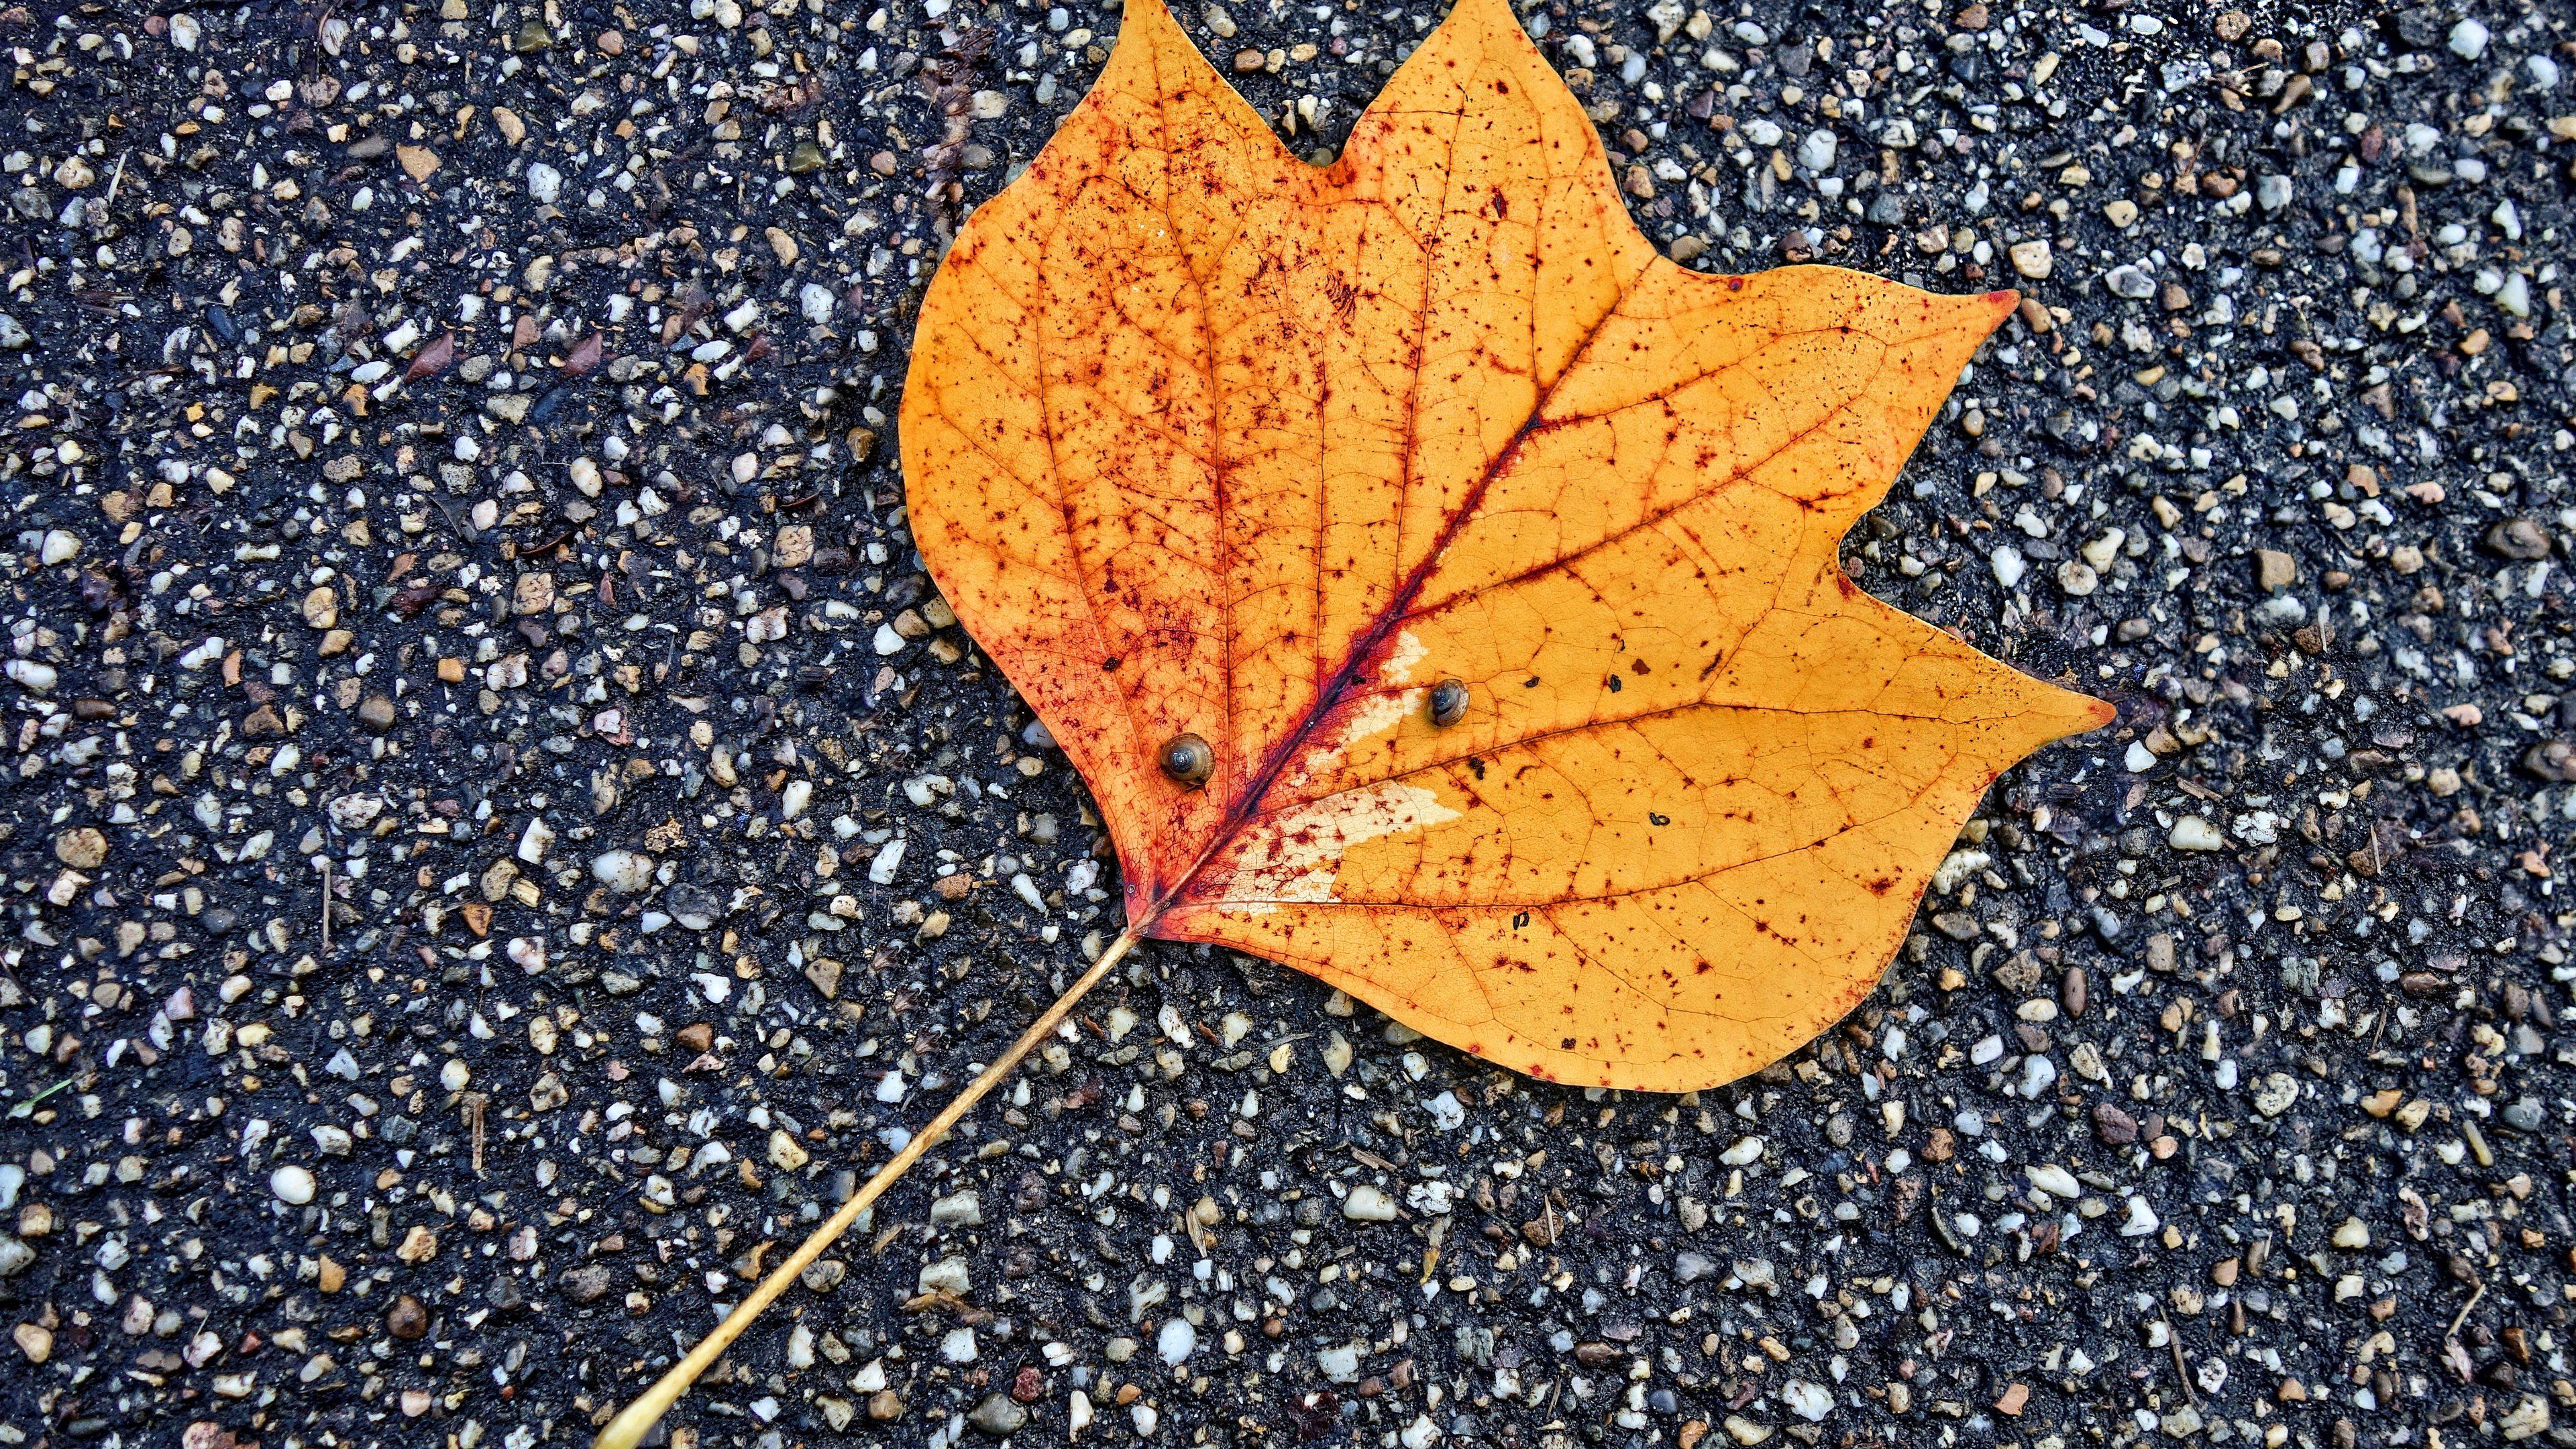 fallen leaf autumn 4k 1540134137 - Fallen Leaf Autumn 4k - nature wallpapers, leaf wallpapers, hd-wallpapers, fallen wallpapers, autumn wallpapers, 5k wallpapers, 4k-wallpapers